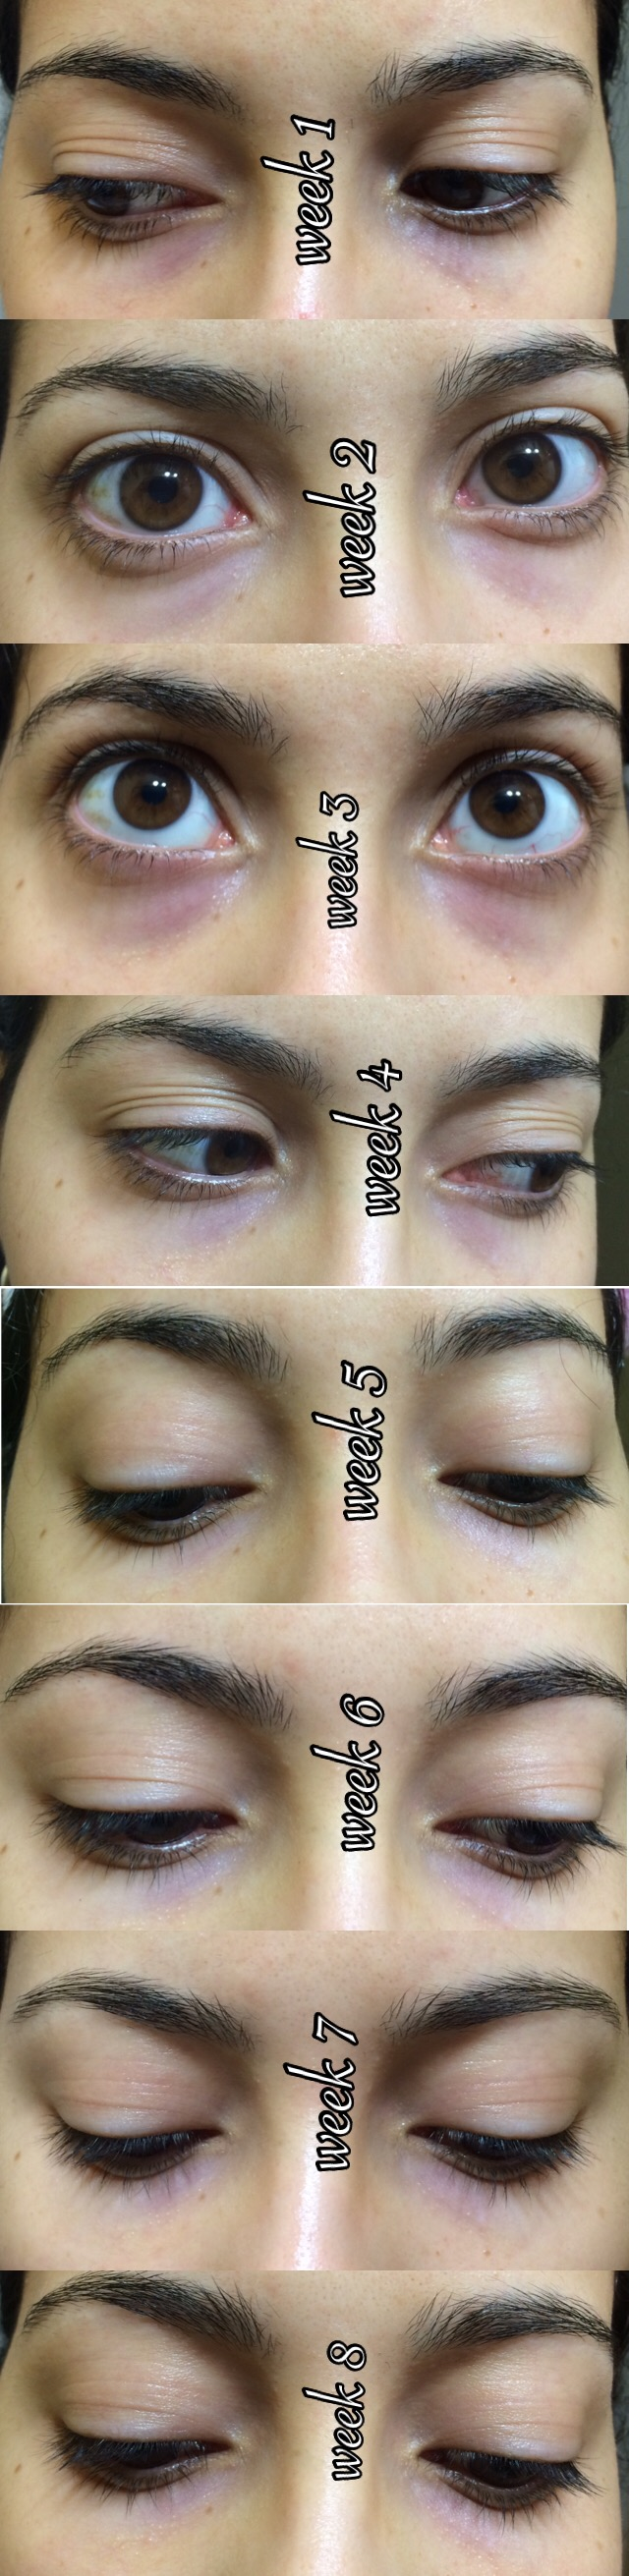 DeVita, Natural Skin Care, Acne Solution Pads, 2 oz (pack of 6)